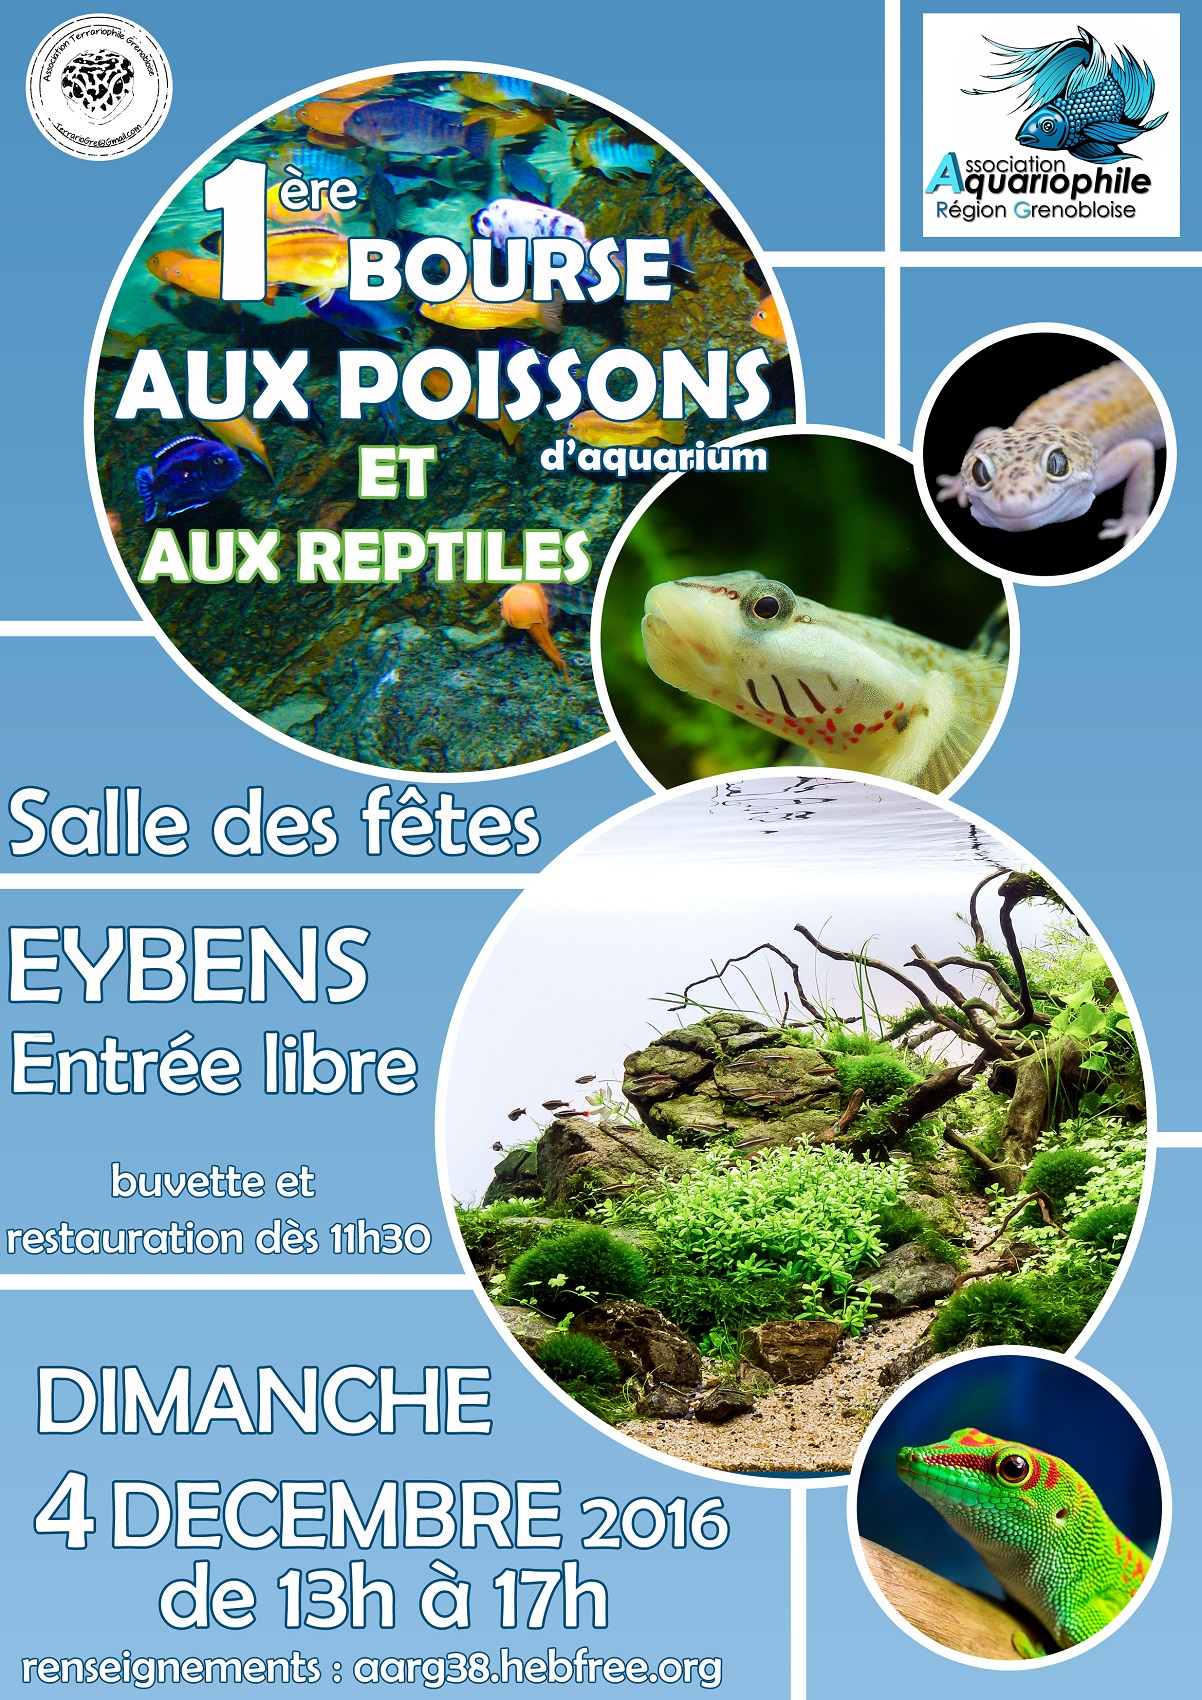 Bourse de Grenoble 04/12/16 160502061319625682